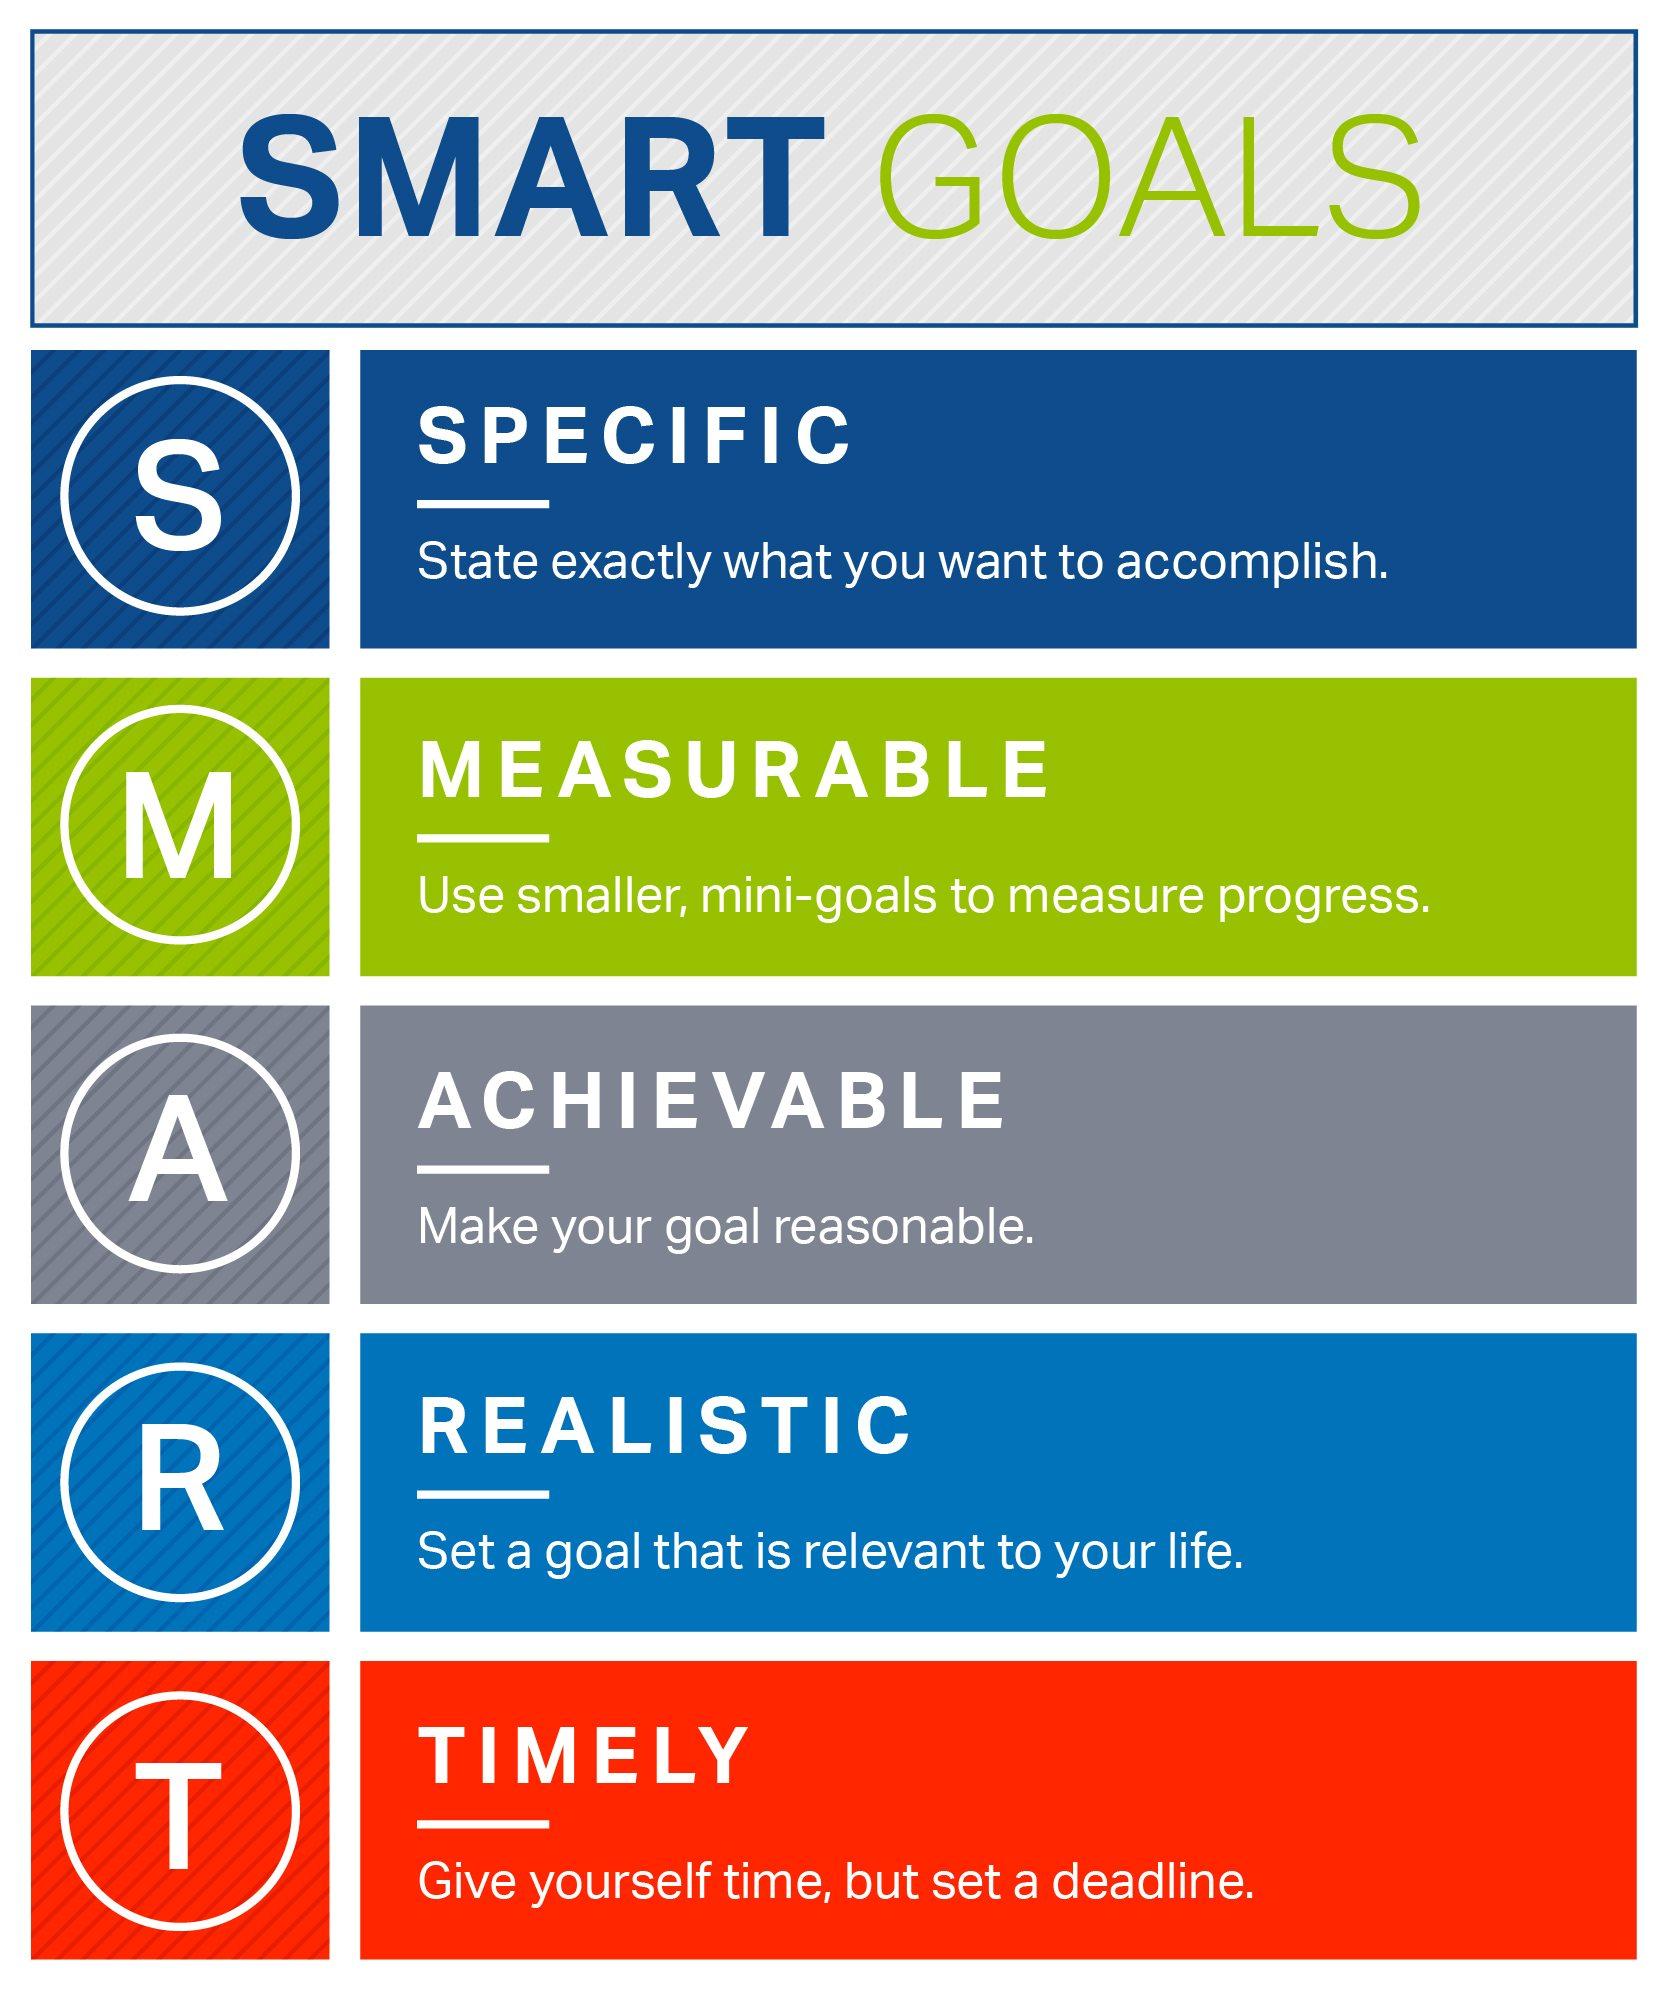 smart goals 2019